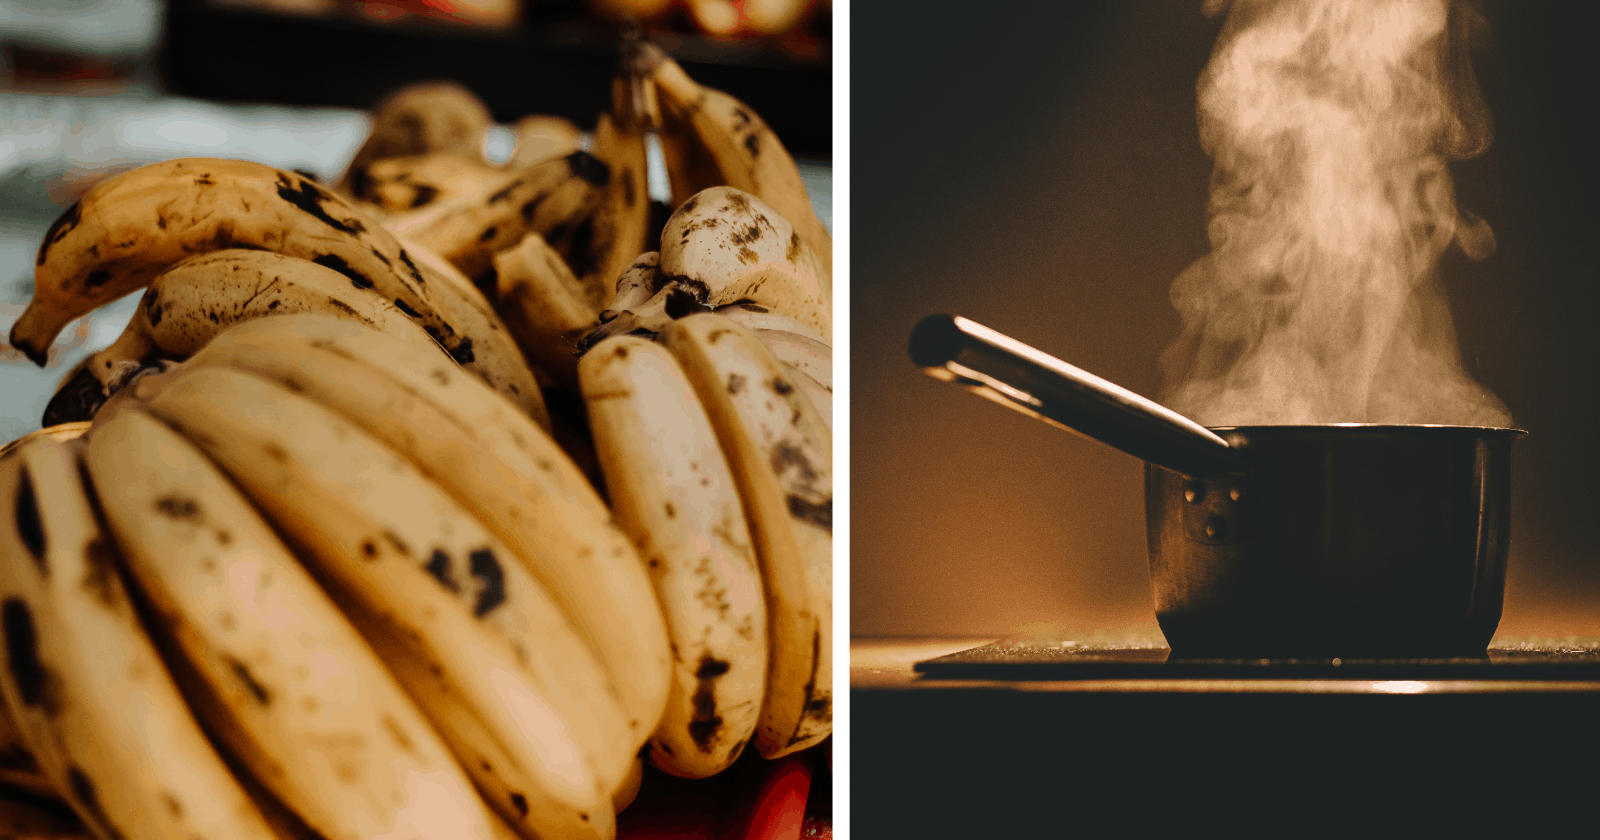 separamos-as-mais-deliciosas-receitas-para-aproveitar-as-bananas-maduras